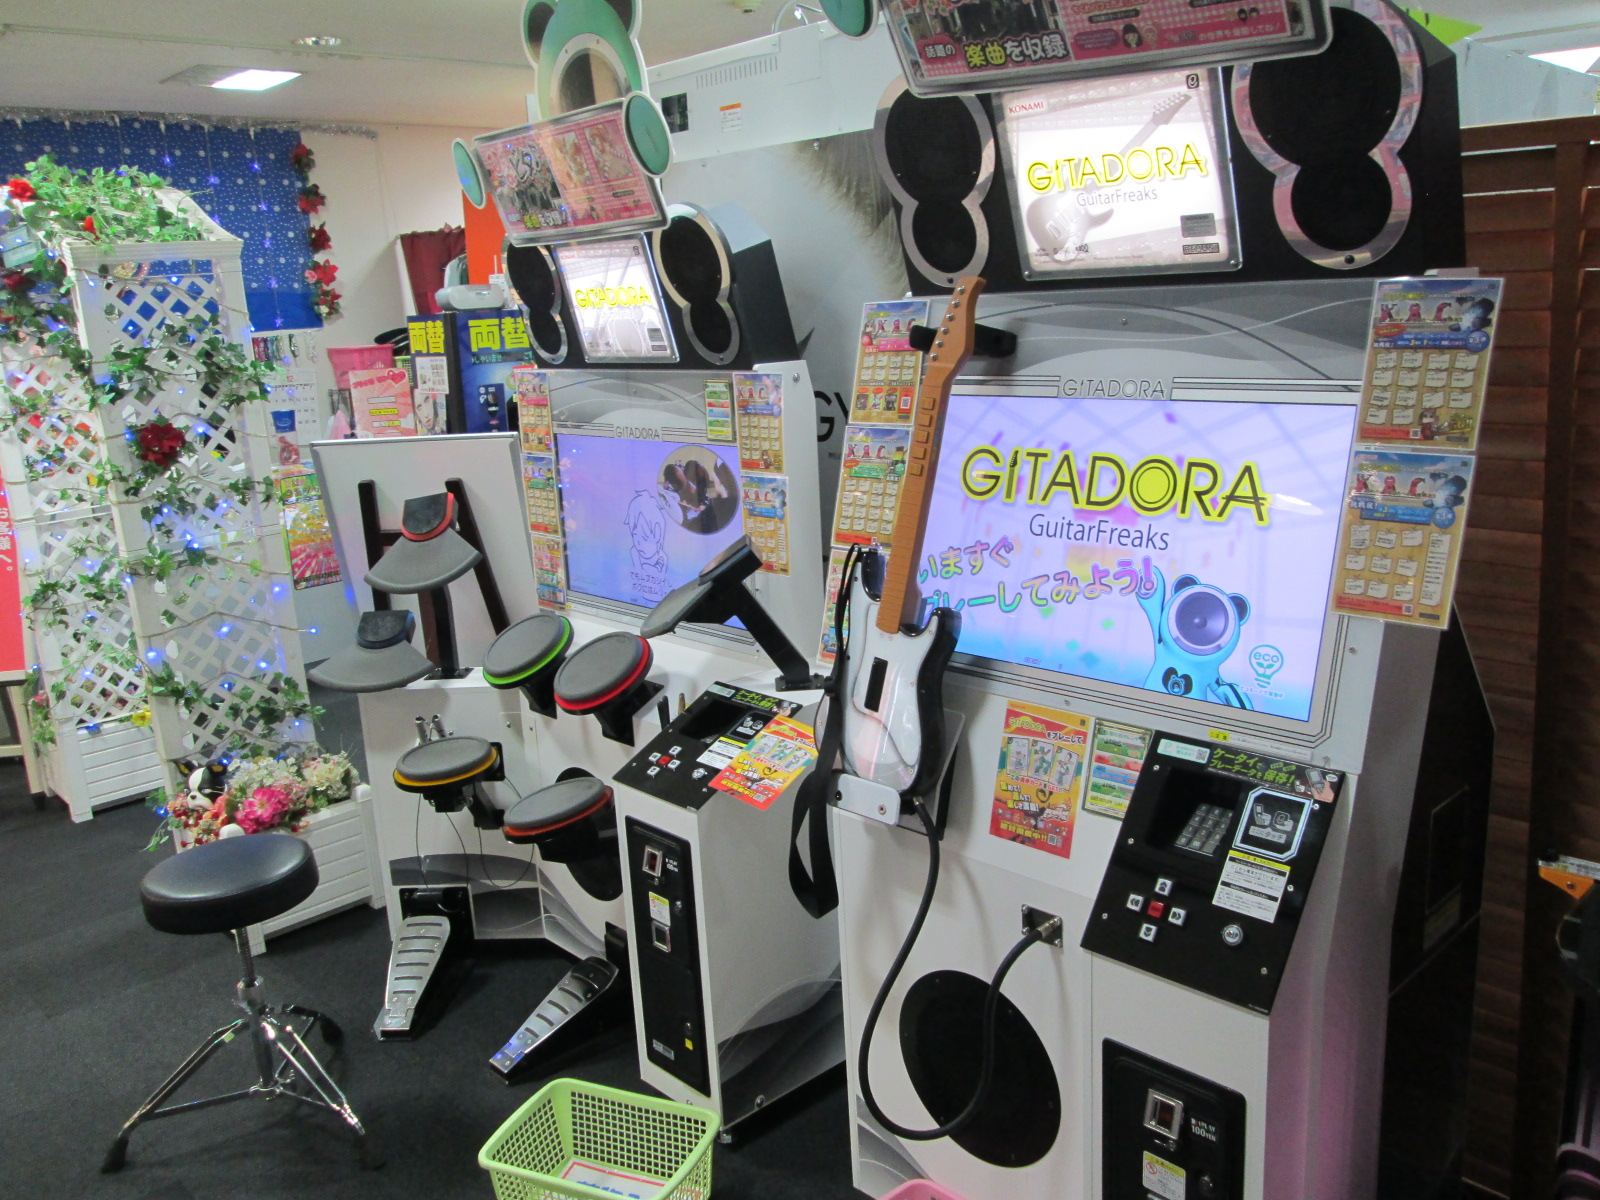 A Japanese Guitar Hero equivalent